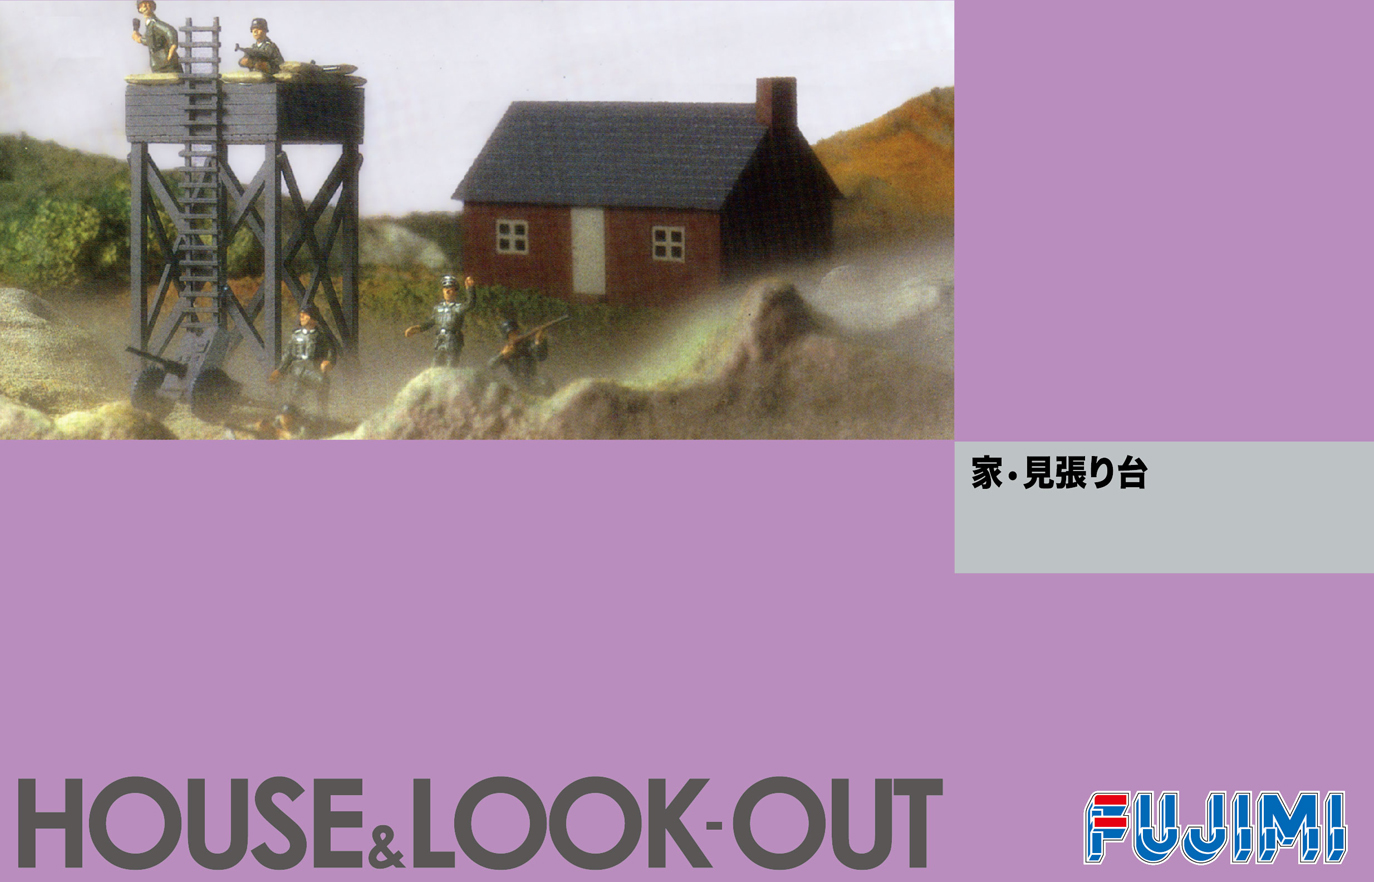 Fujimi Hause & Watch stand